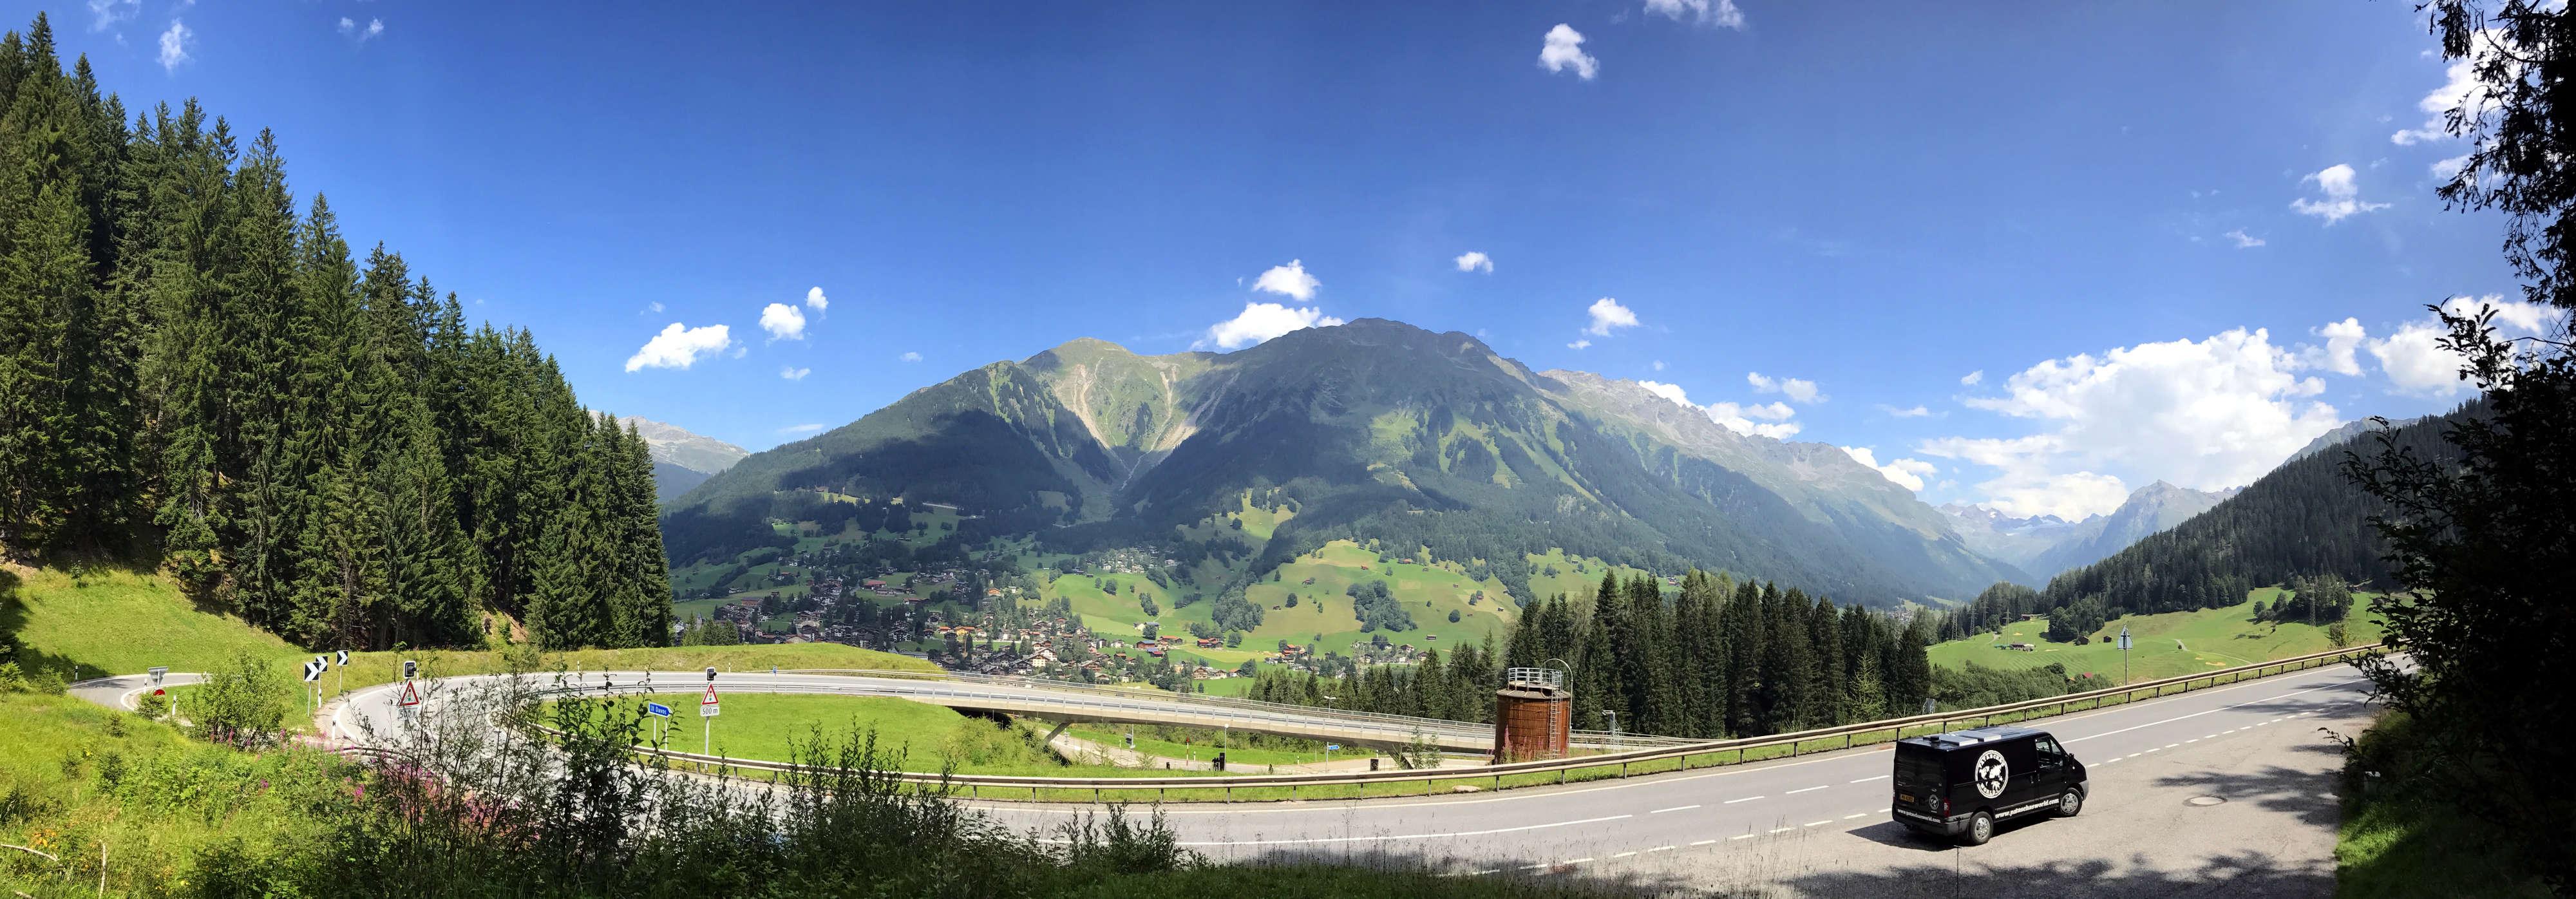 Grand Tour of Switzerland SwissGrandTour Schweiz Roadtrip Campervan